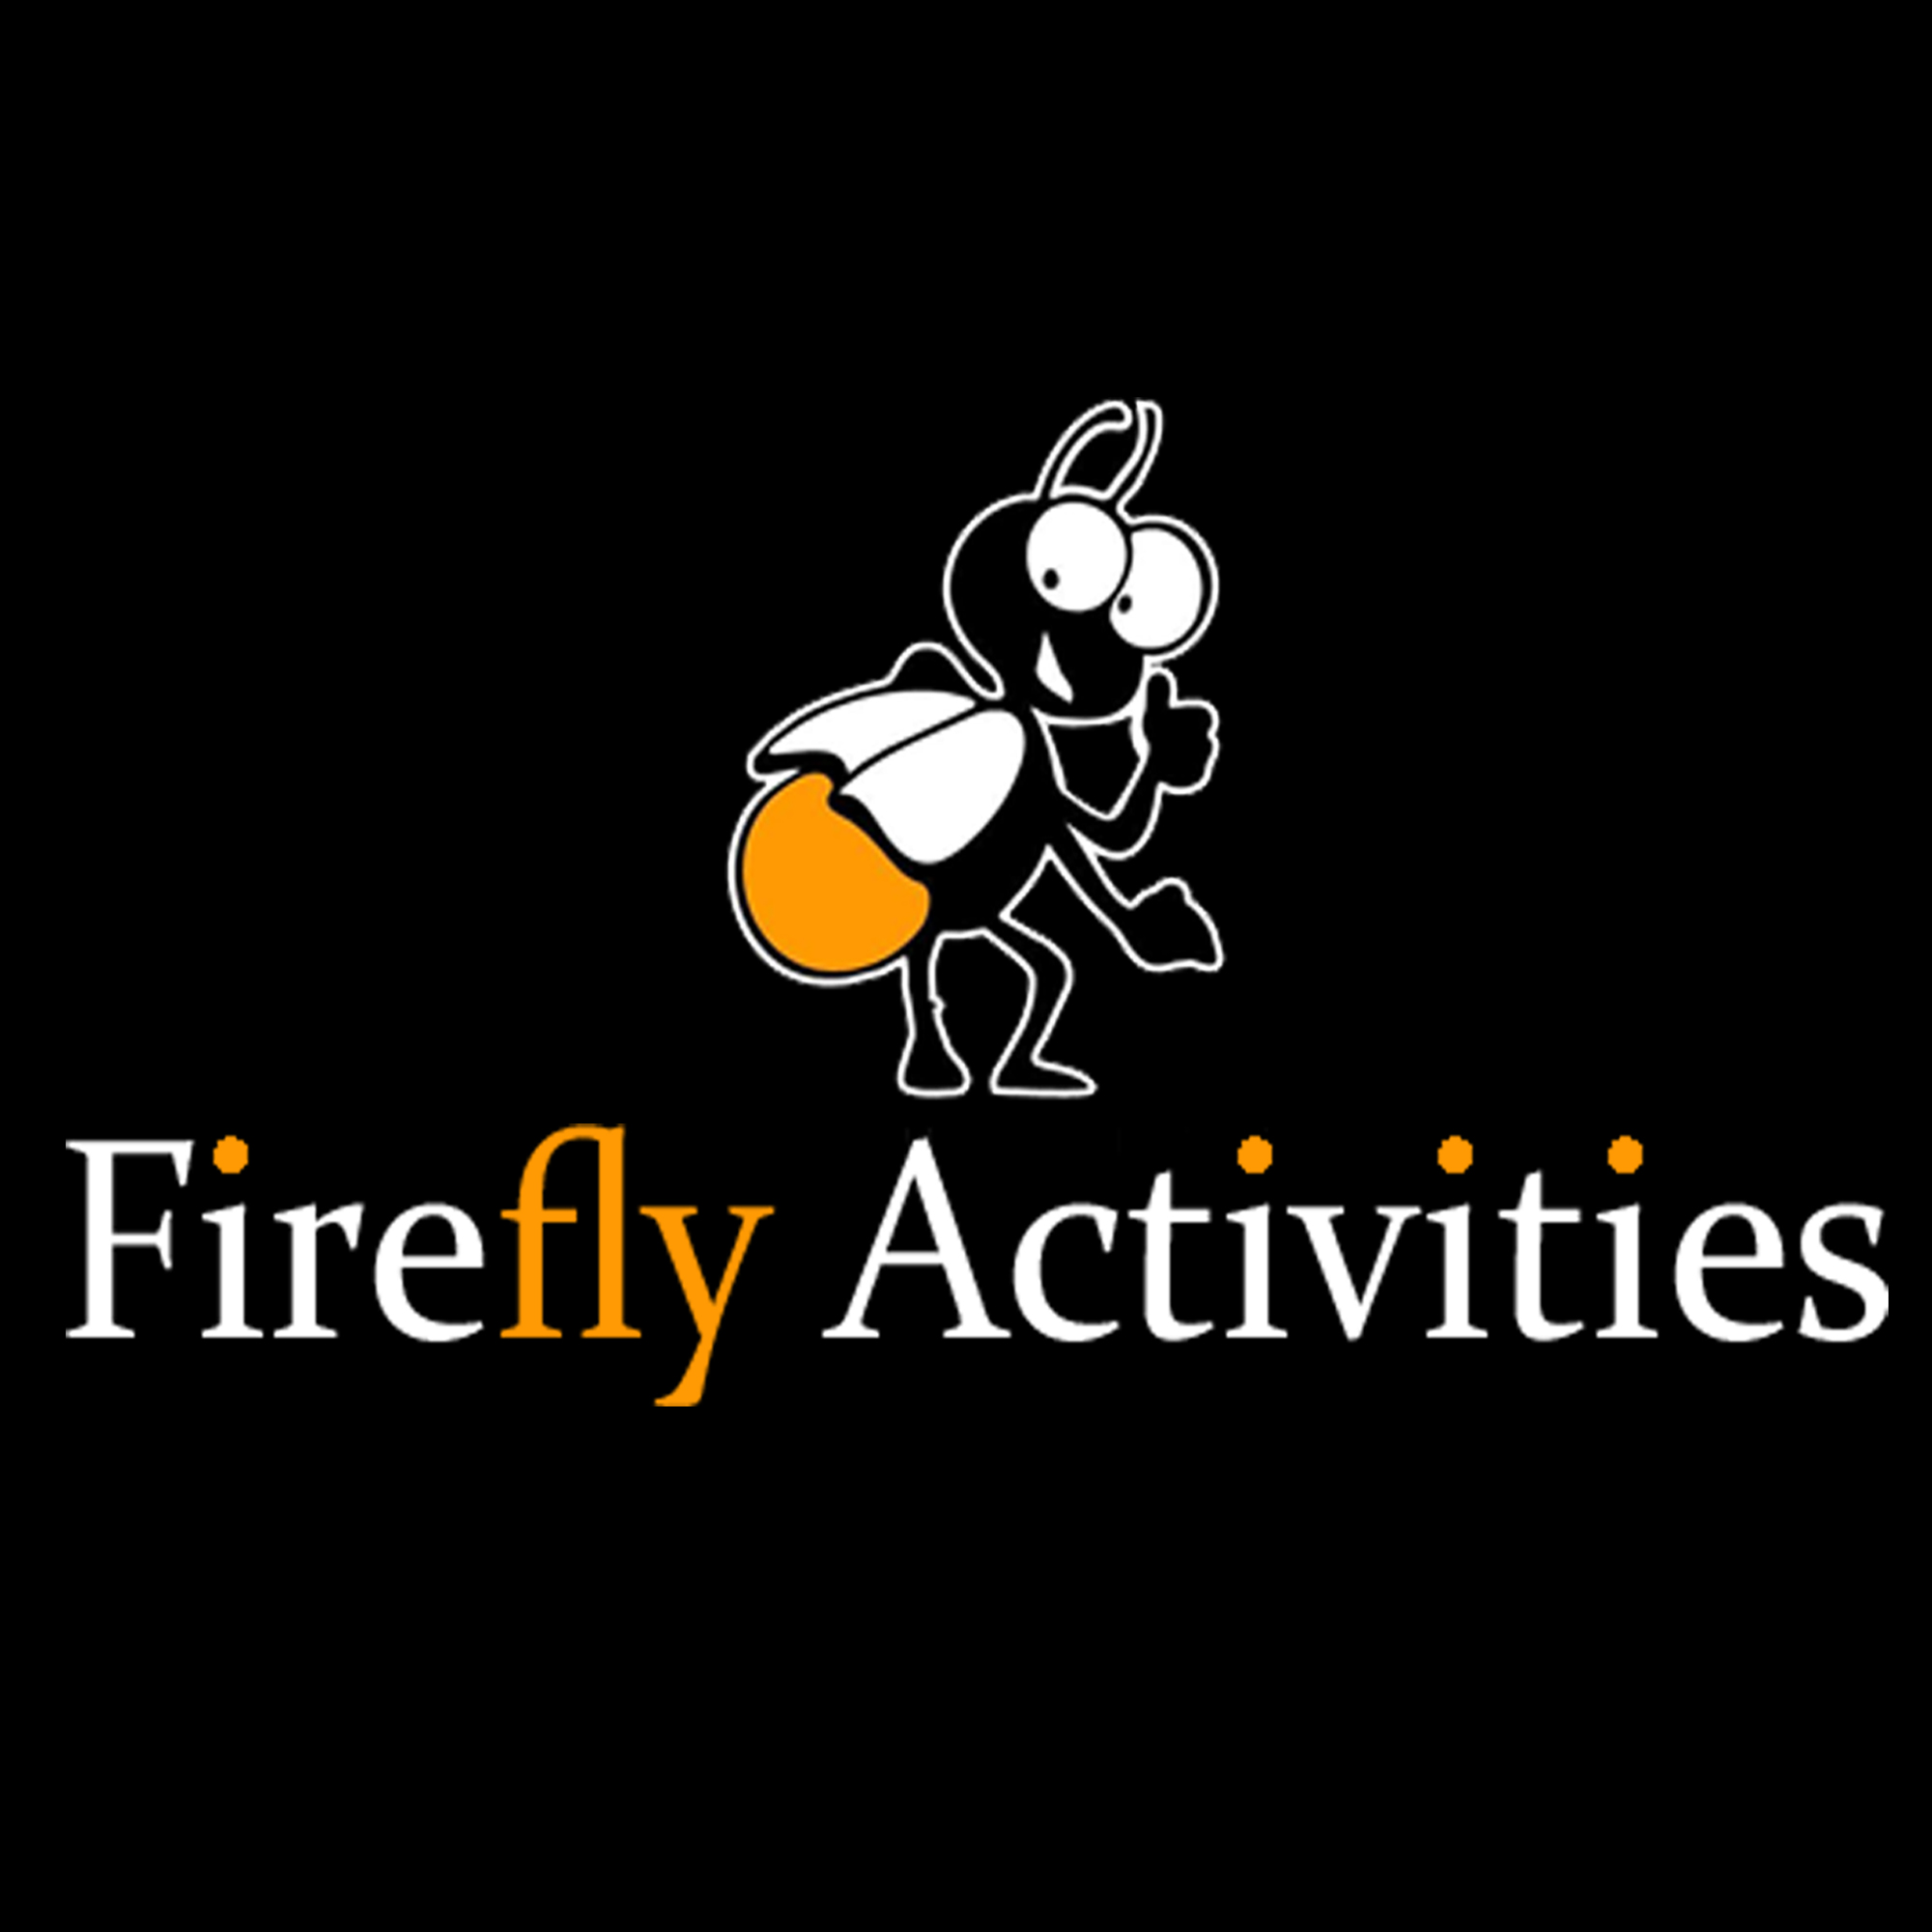 FireFly Activities